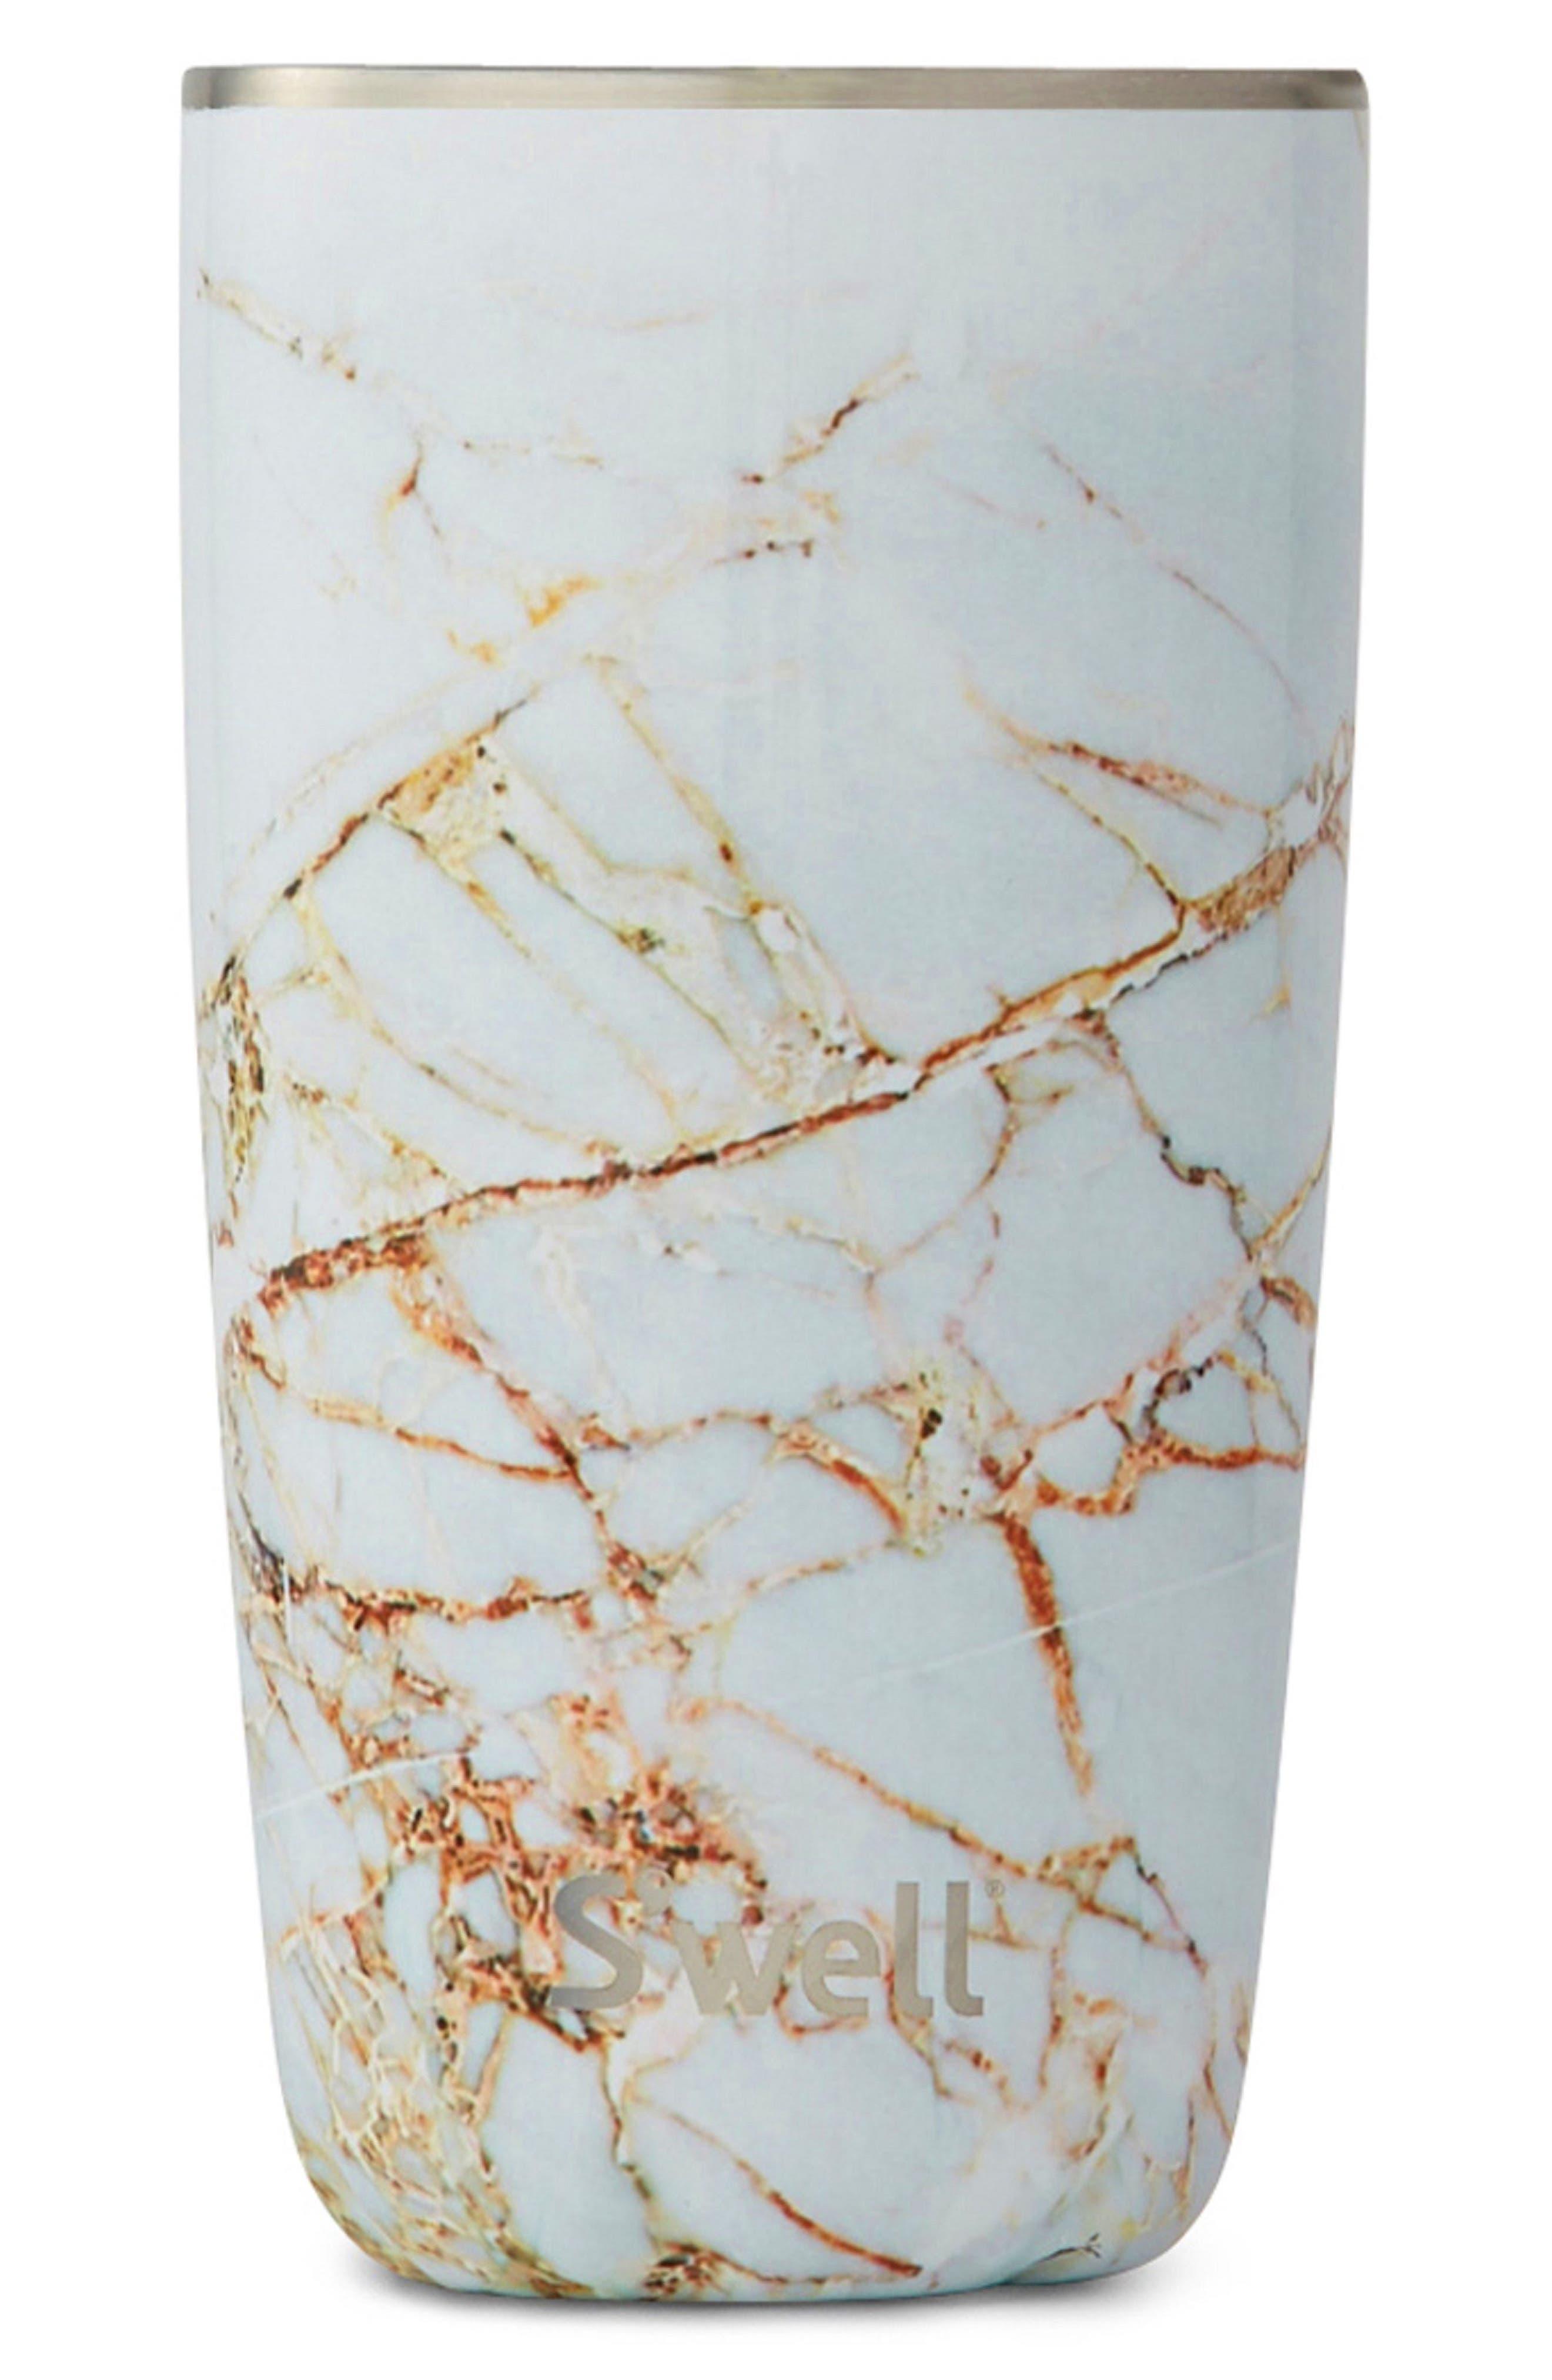 S'well Calacatta Gold 18-Ounce Insulated Tumbler